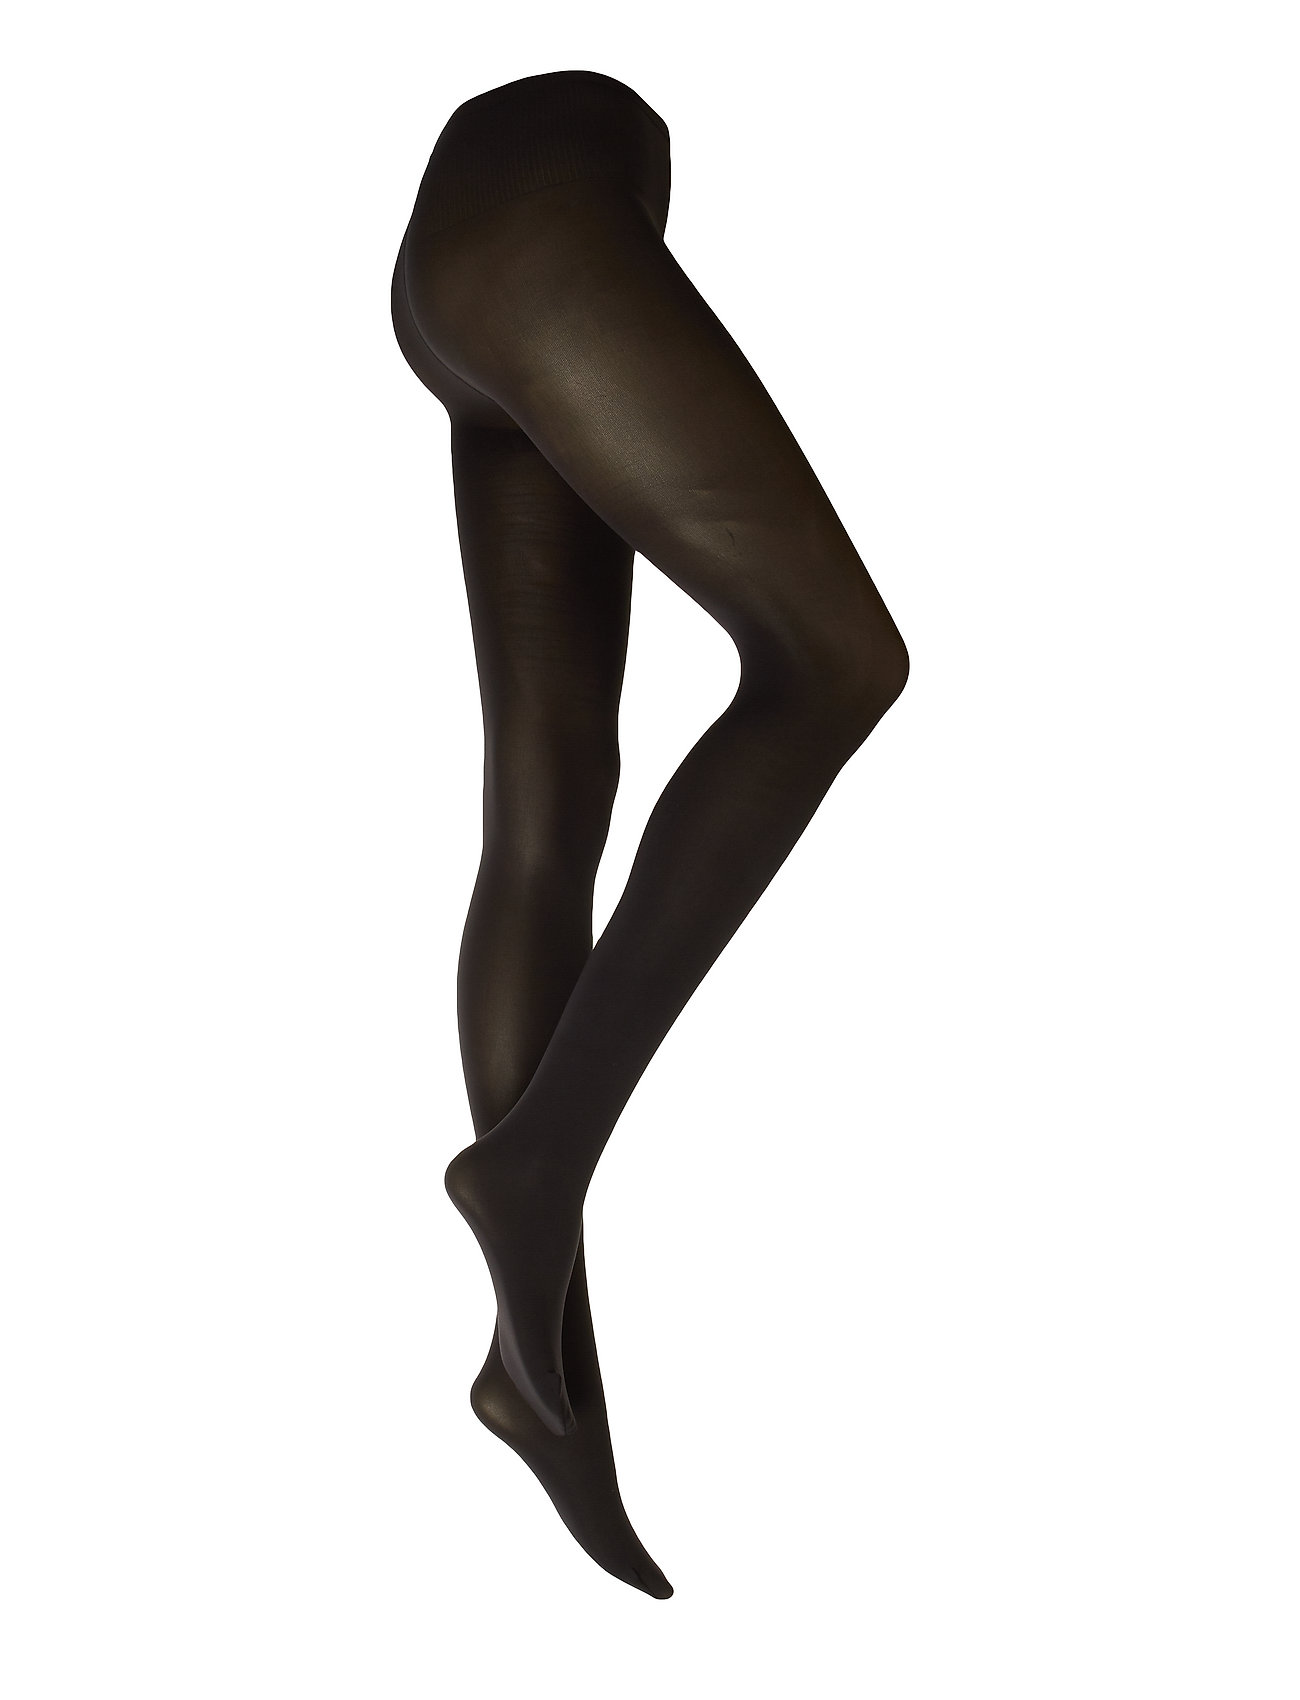 Swedish Stockings Olivia Premium tights 60D - NEARLY BLACK